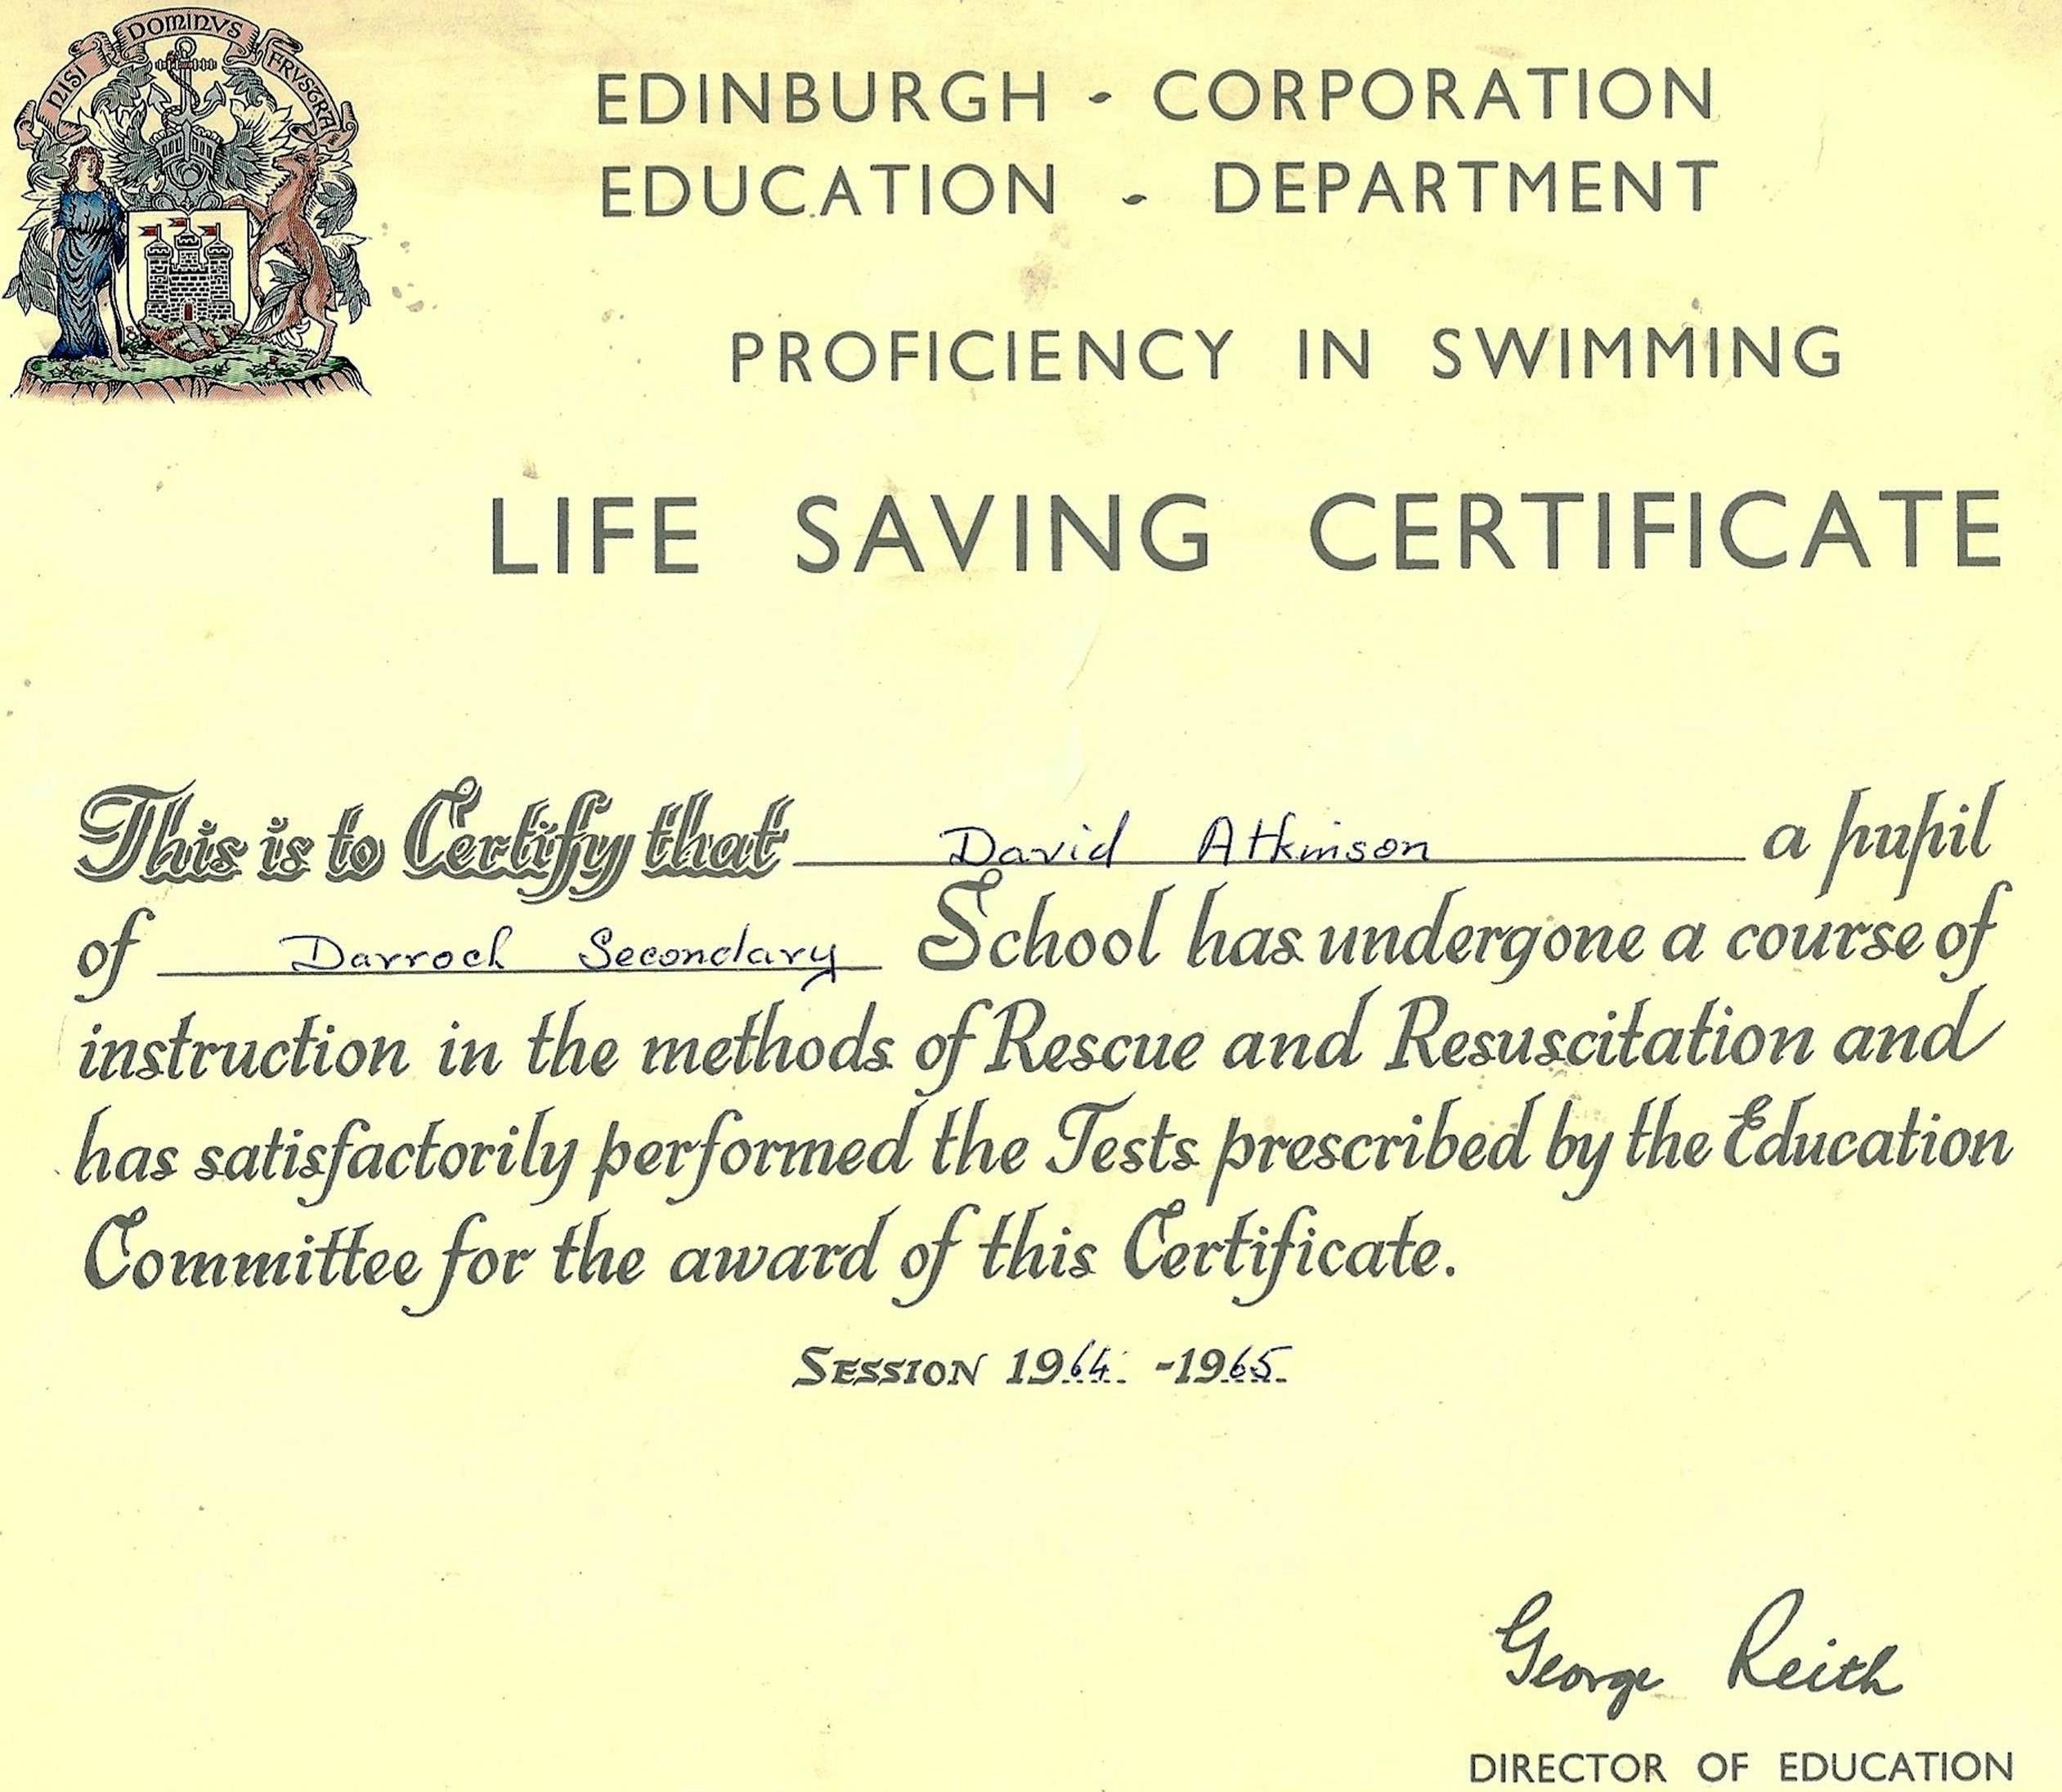 Darroch Secondary School With Life Saving Award Certificate Template